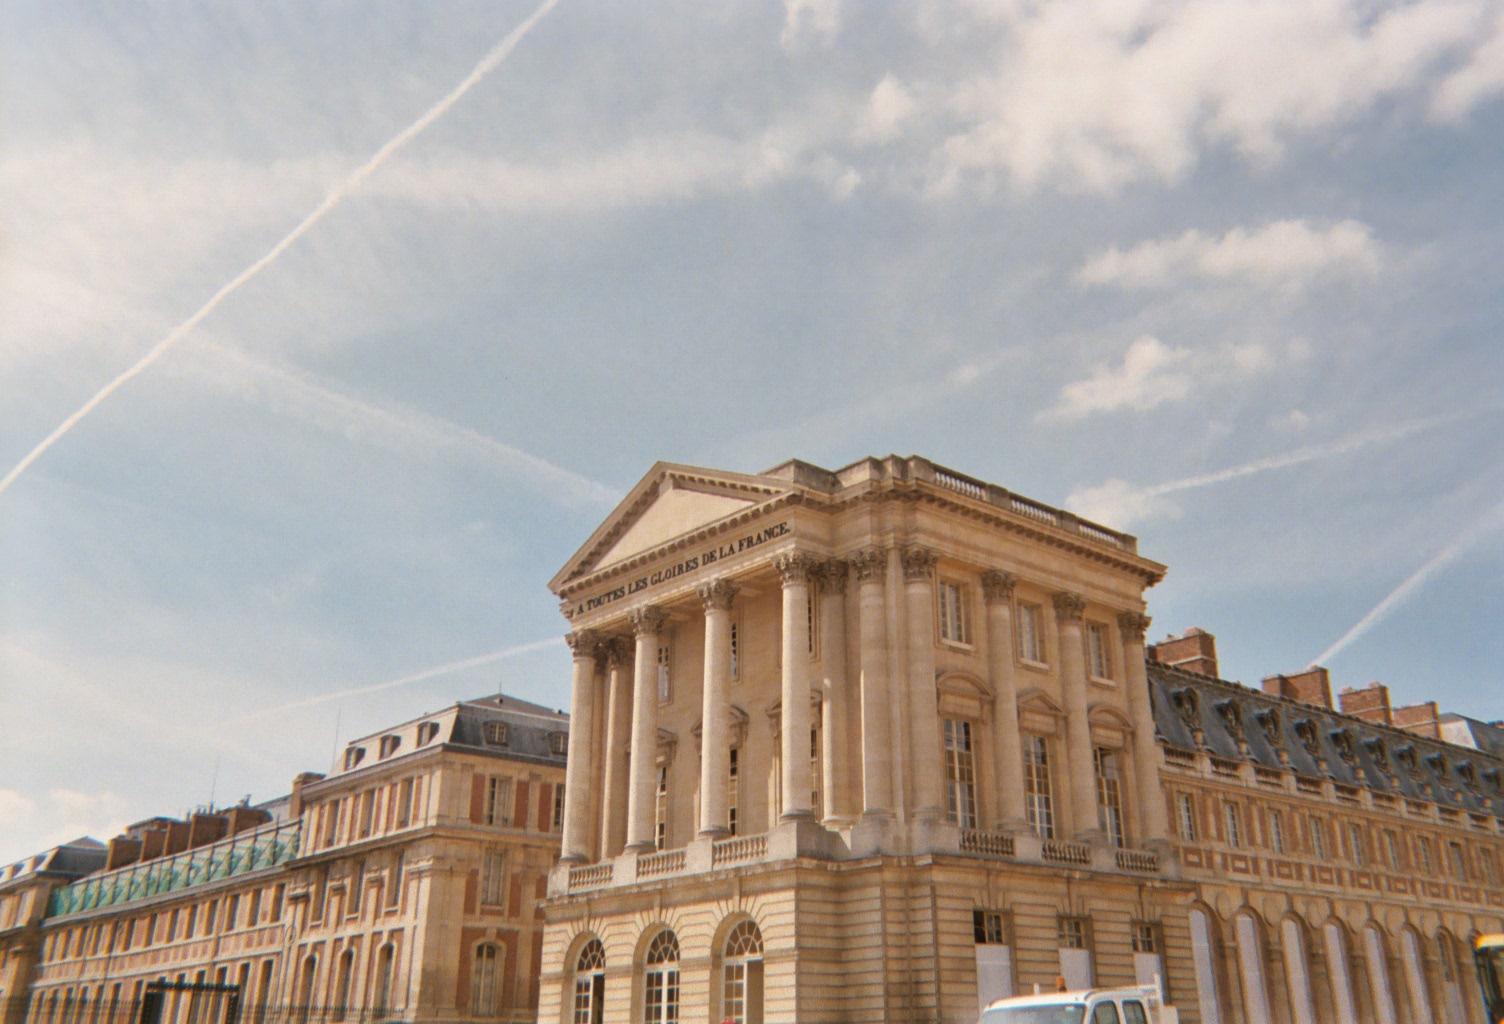 Michael Shade: Château de Versailles